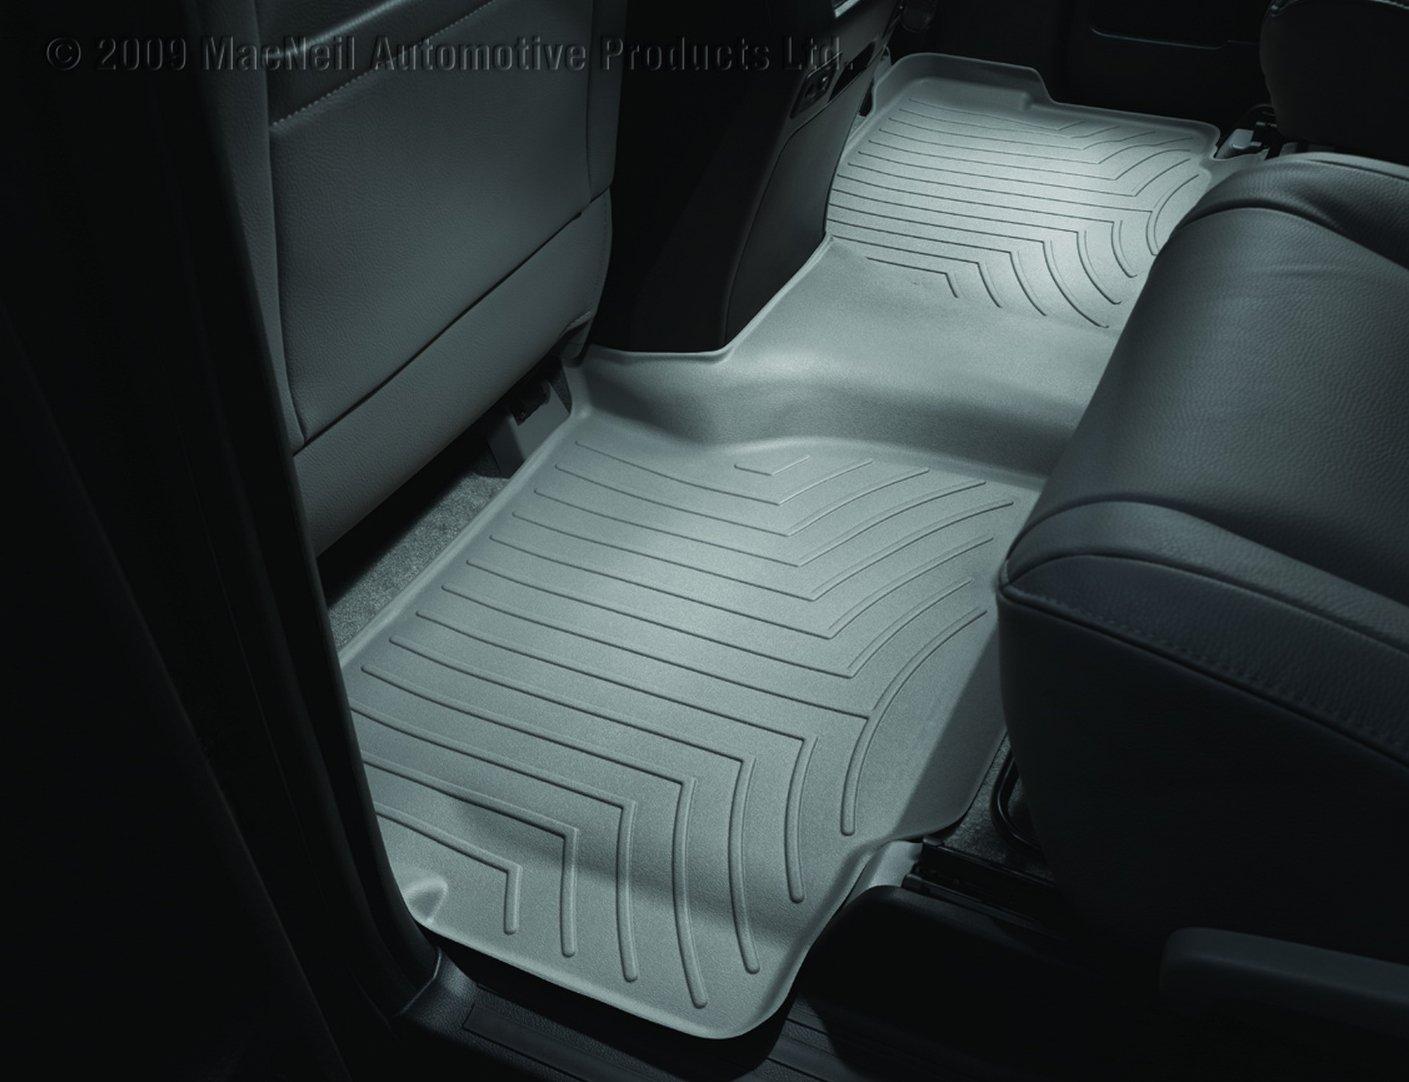 Grey 460934 WeatherTech Custom Fit Rear FloorLiner for Toyota Sequoia